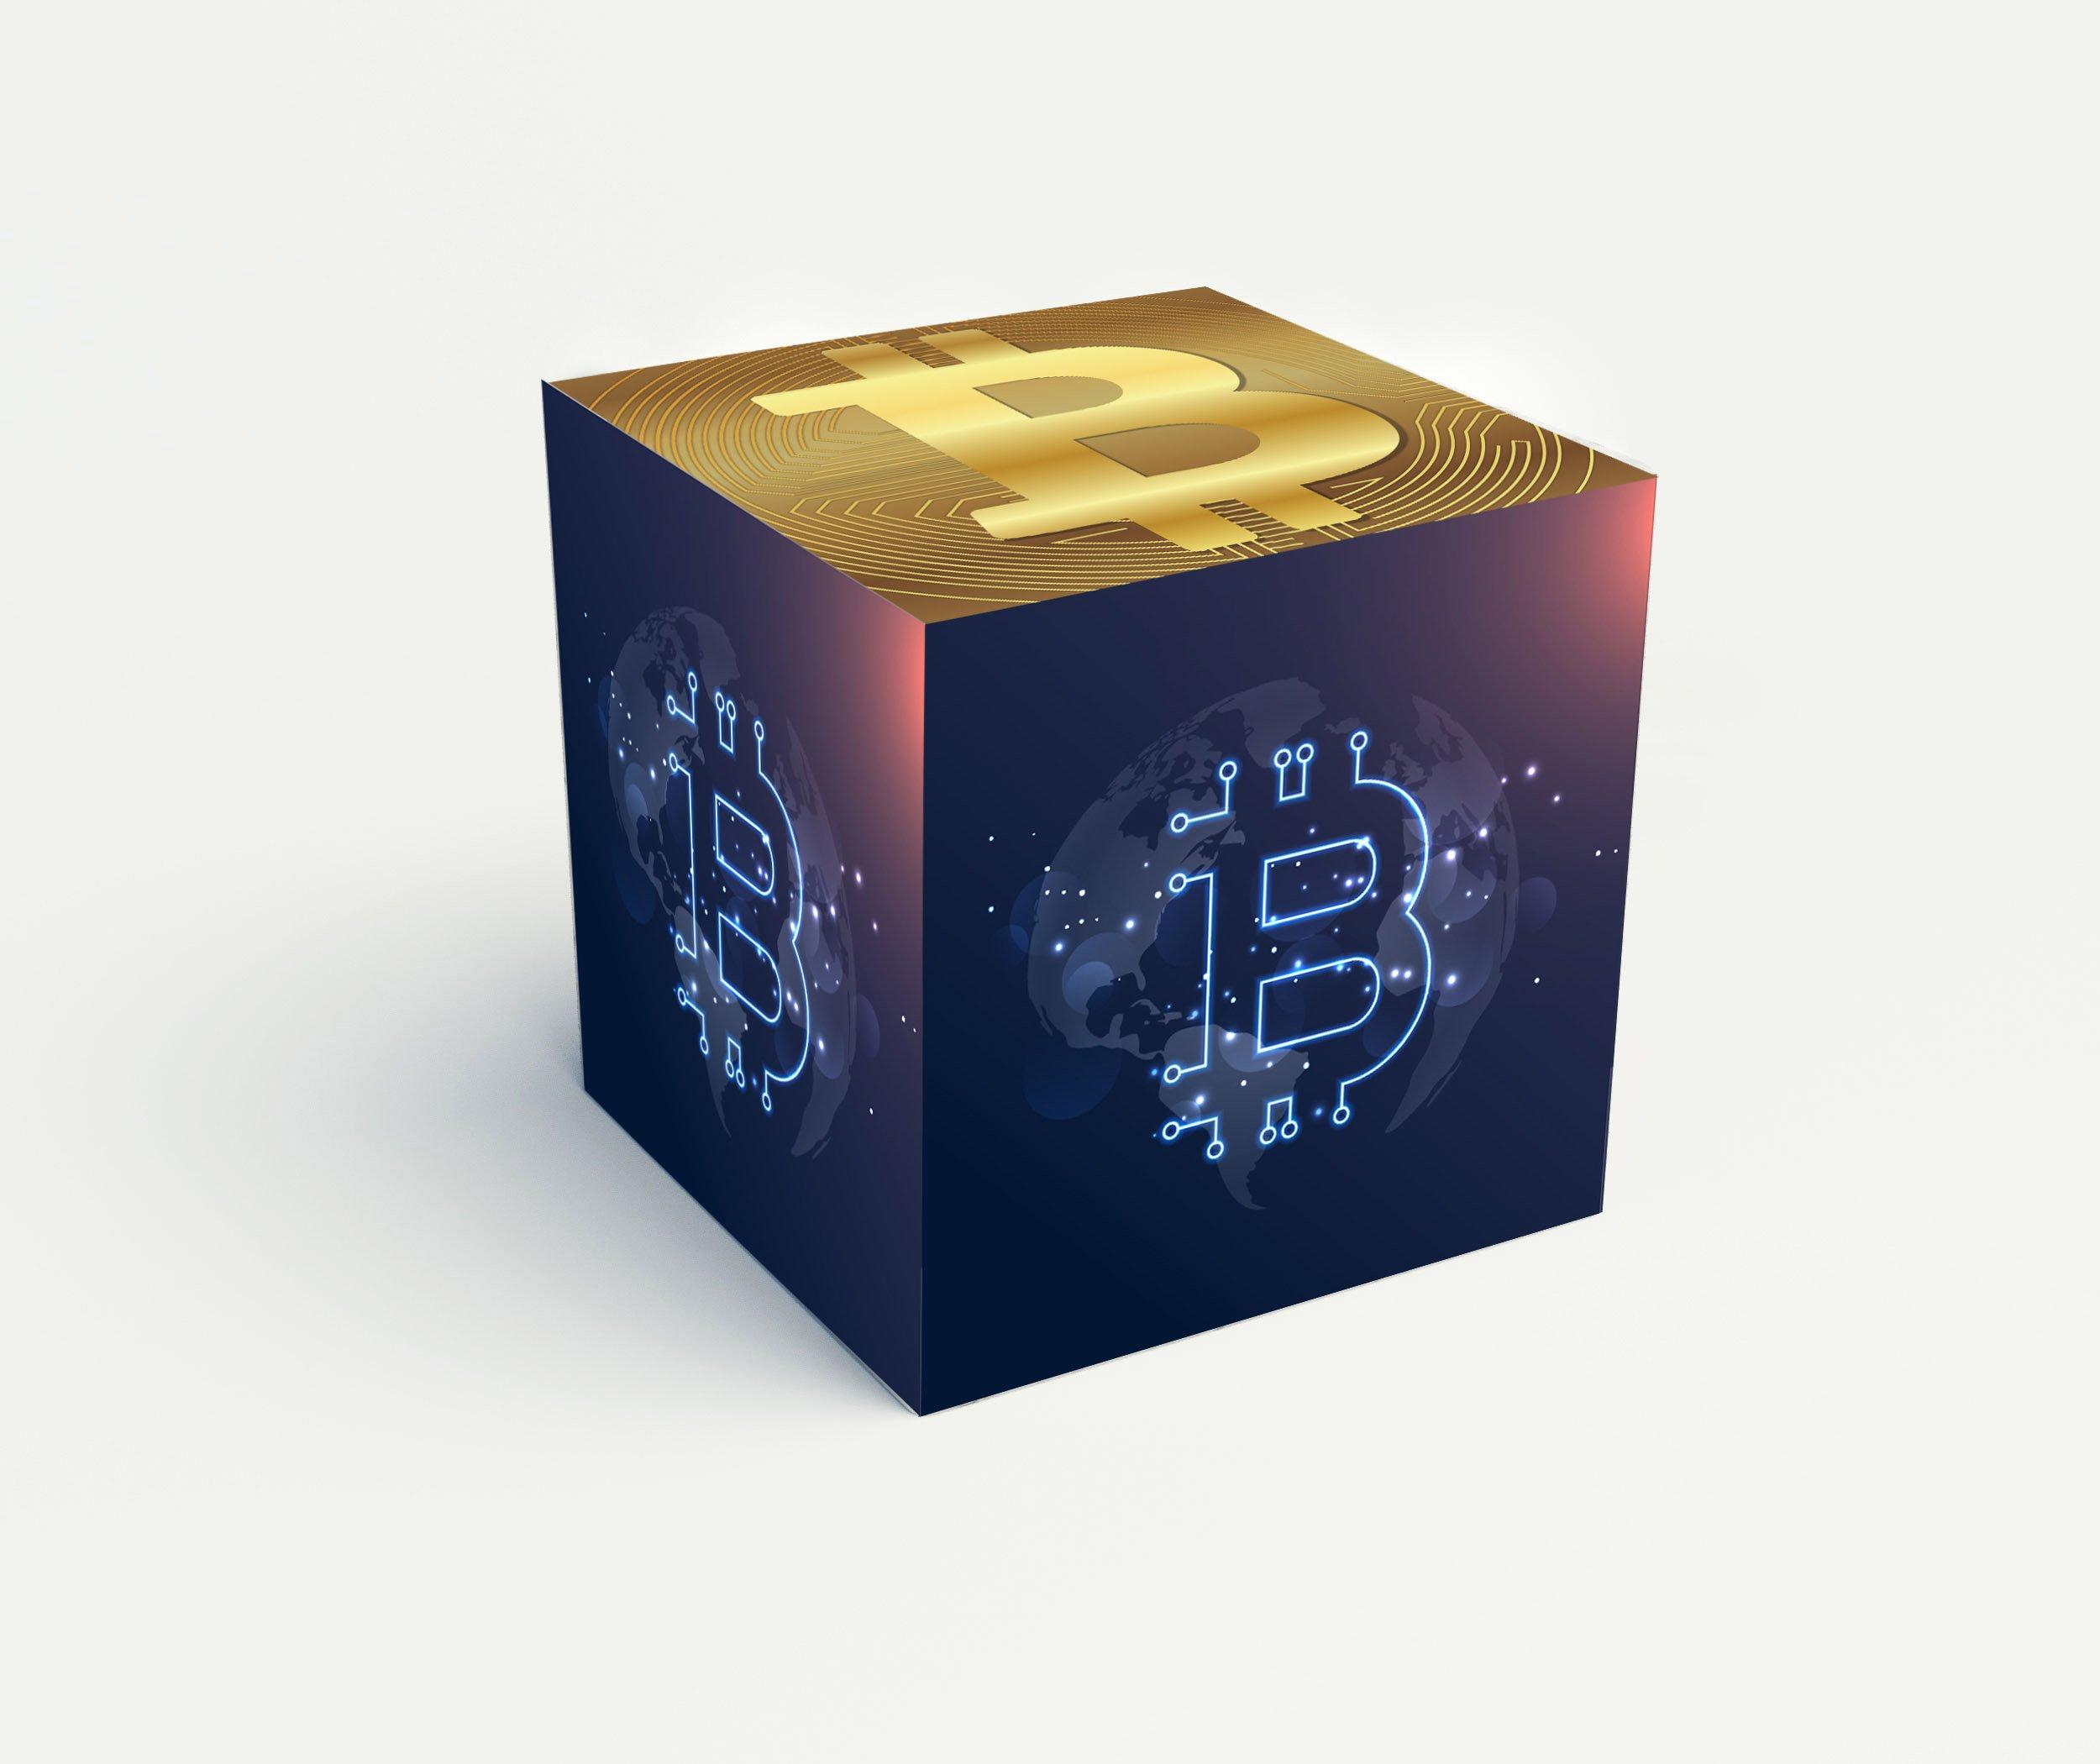 Bitcoin Dark Blockchain Block 4-in-1 / Indoor Bean Bag Ottoman Pouf Cube Table, 17.75'' x 17.75'' x 17.75''